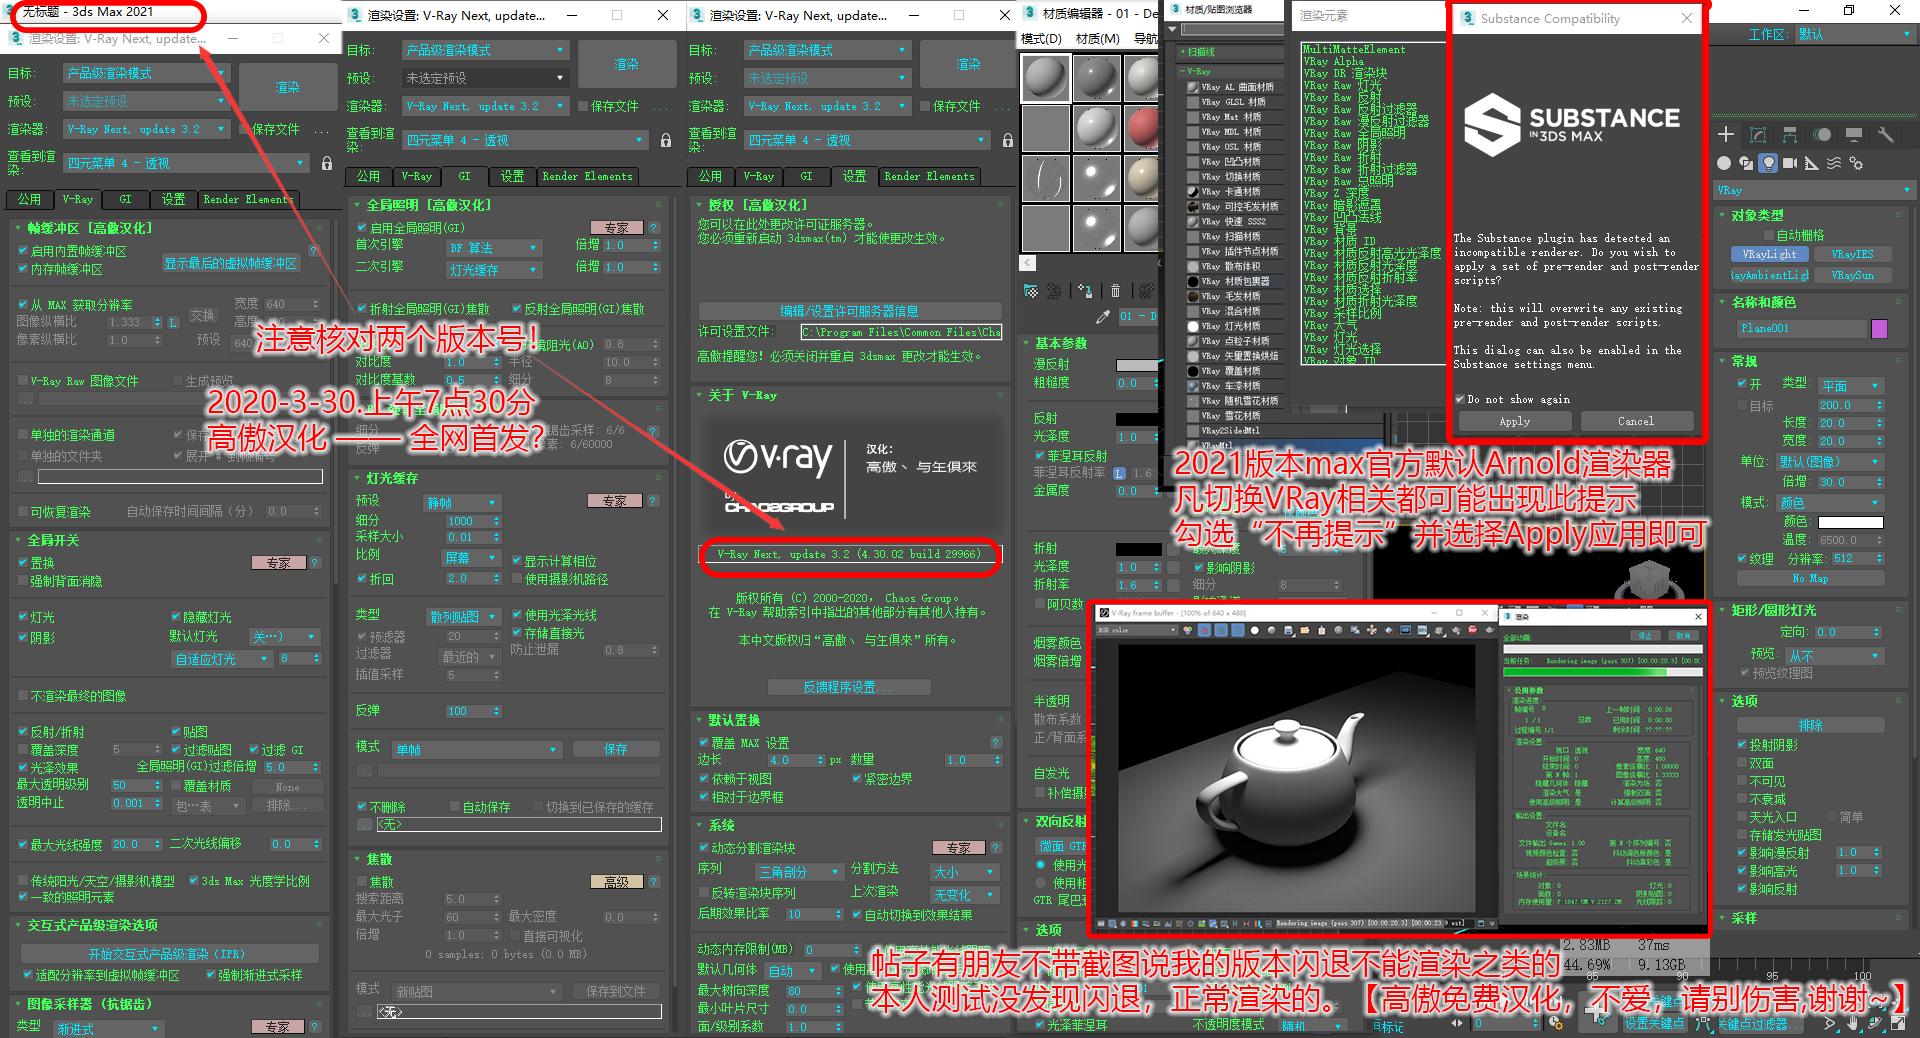 vray_adv_43002_max2021_x64_[高傲]完全免费汉化界面.png